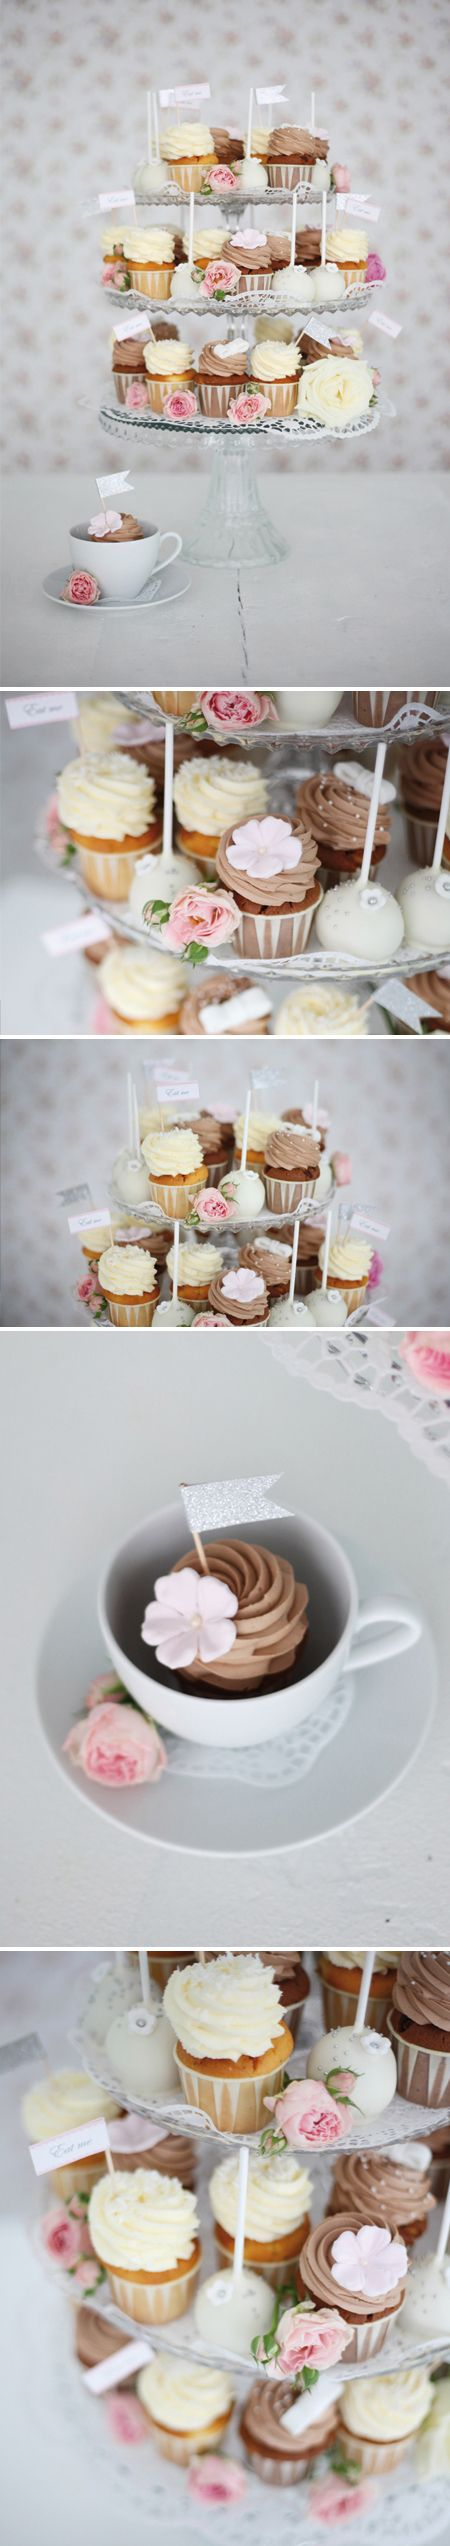 Romantic Cupcake Cakepop Stand